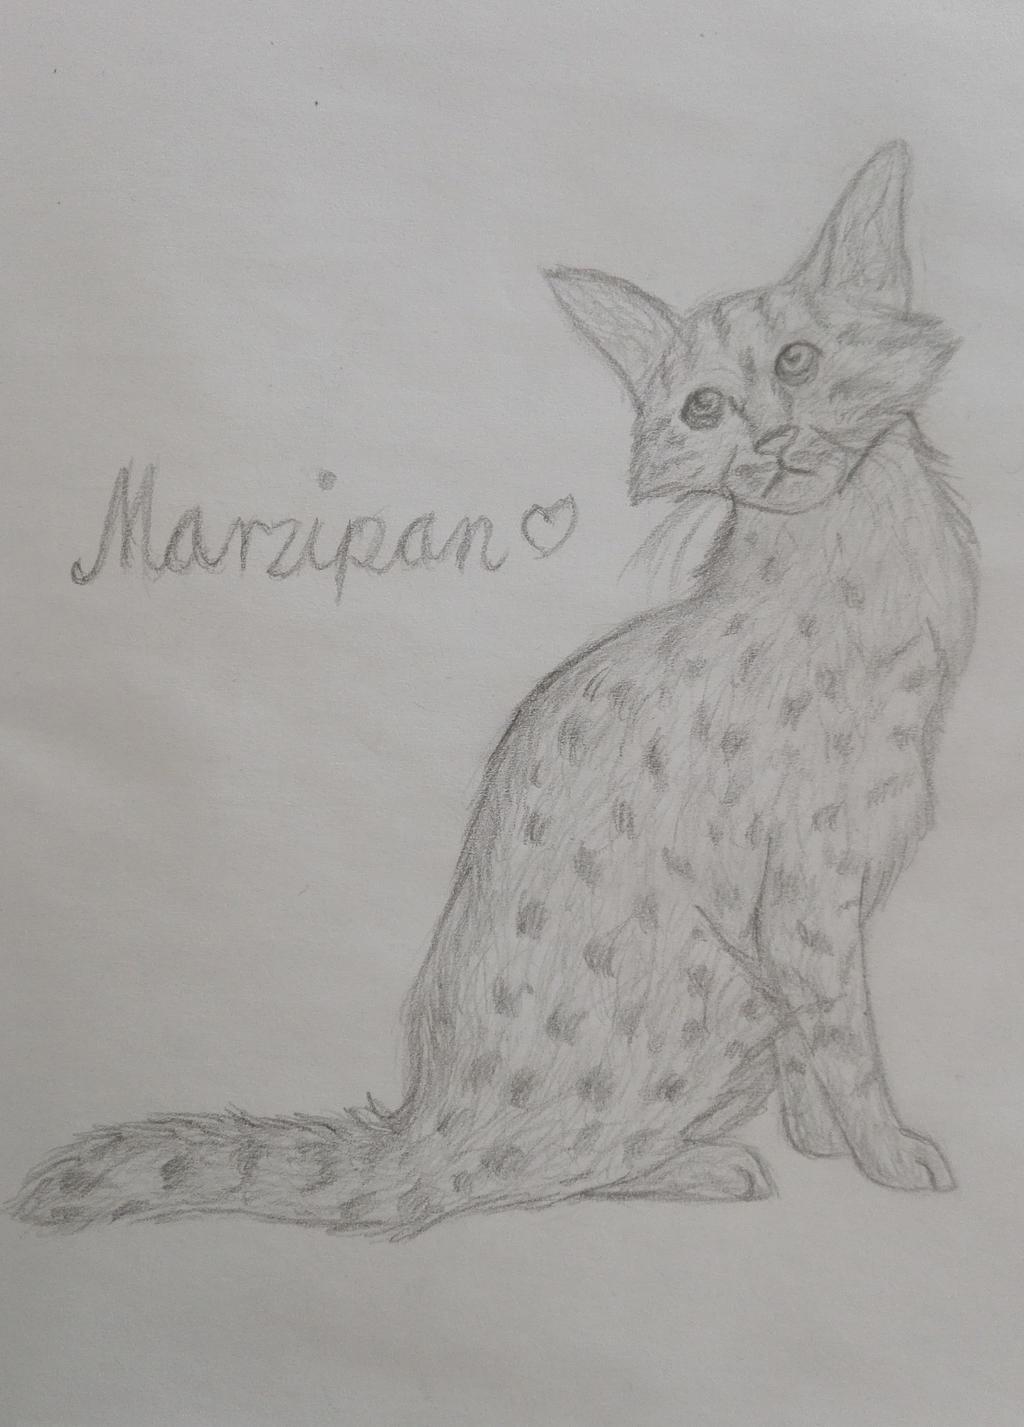 Marzipan by oOFrosteehOo